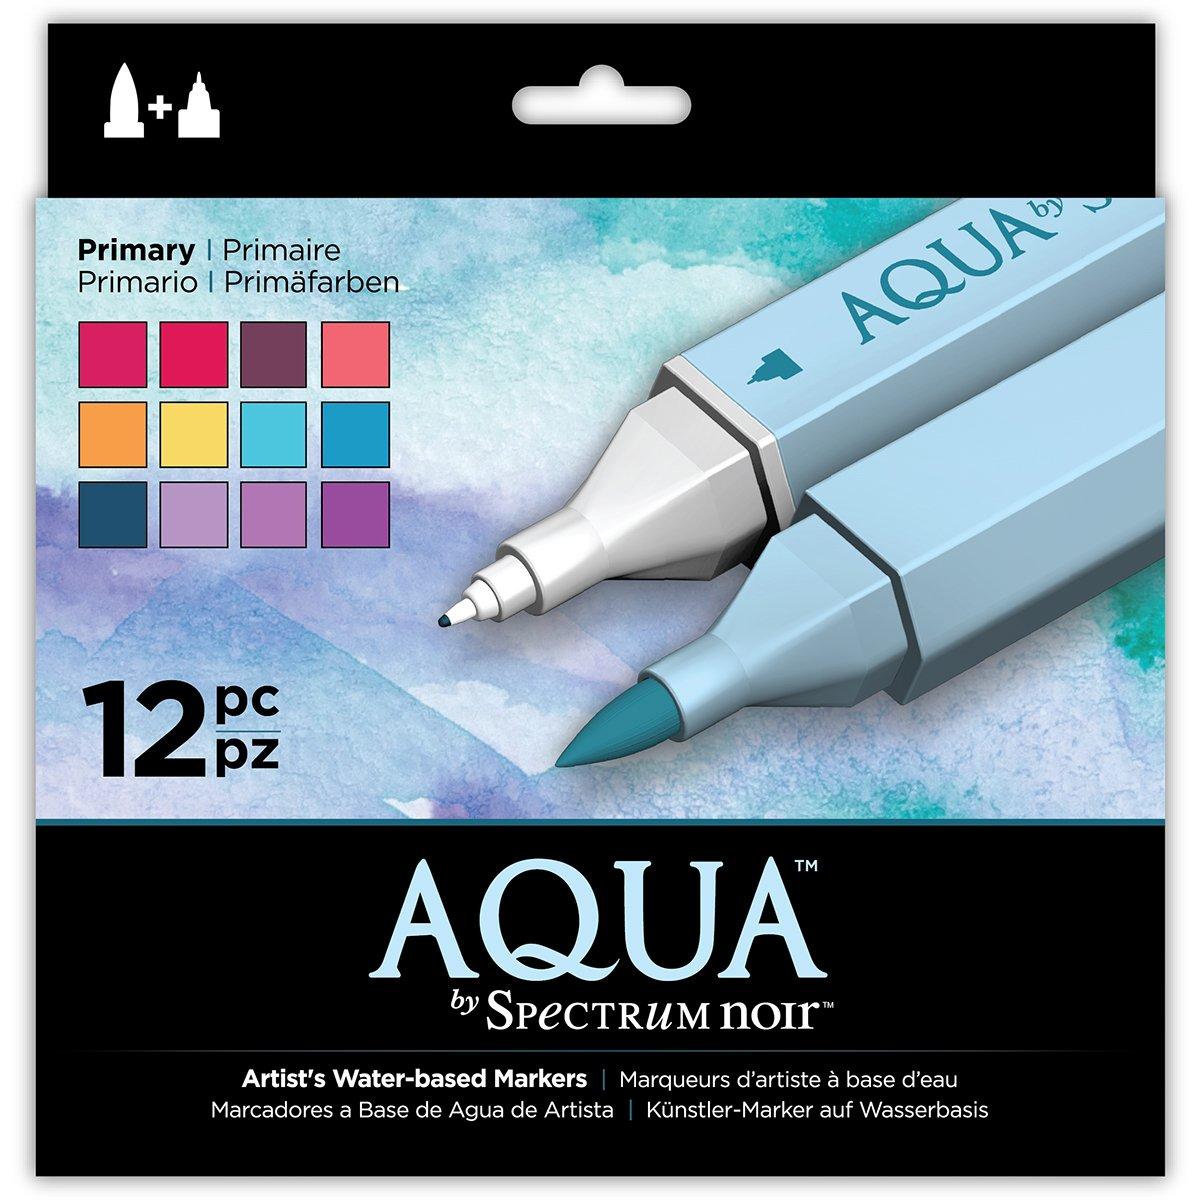 Spectrum Noir Aqua Pennarelli a base d'acqua, plastica, Primary, 19 x 18.4 x 2.1 cm